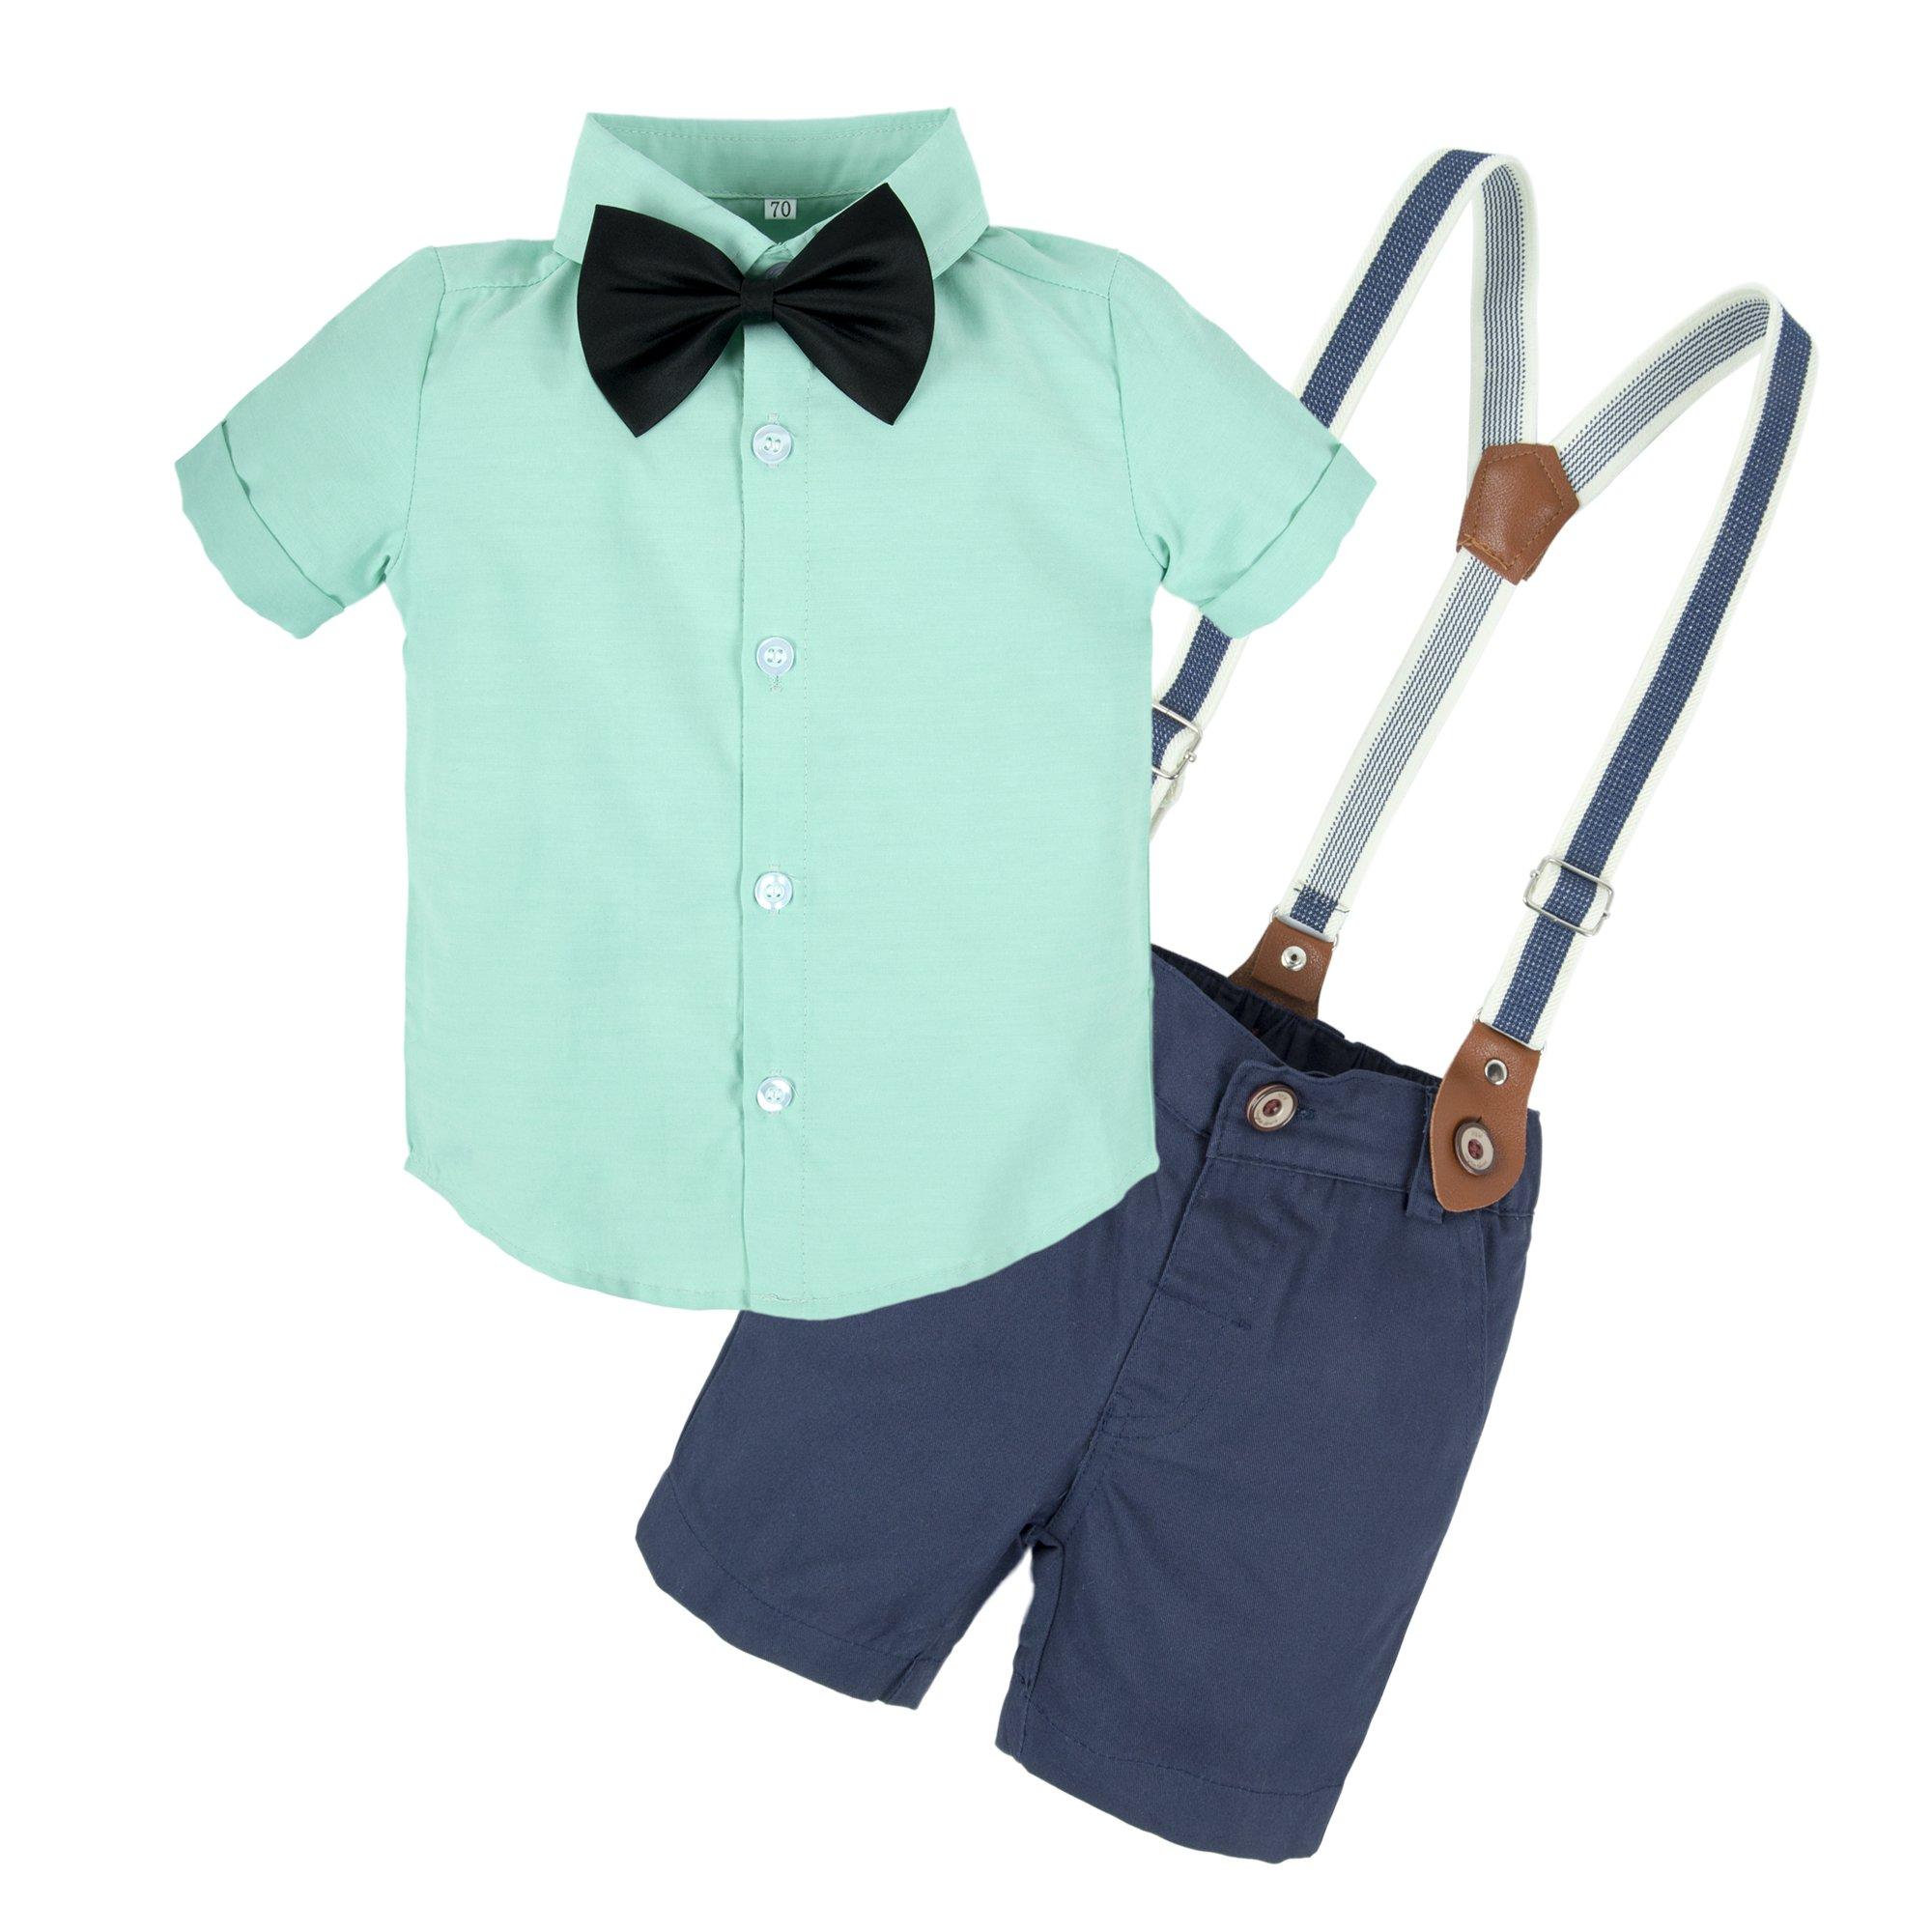 BIG ELEPHANT Baby Boys 2 Pieces Short Sleeve Shirt Suspender Shorts Set T73-Green-90 12-18 Months